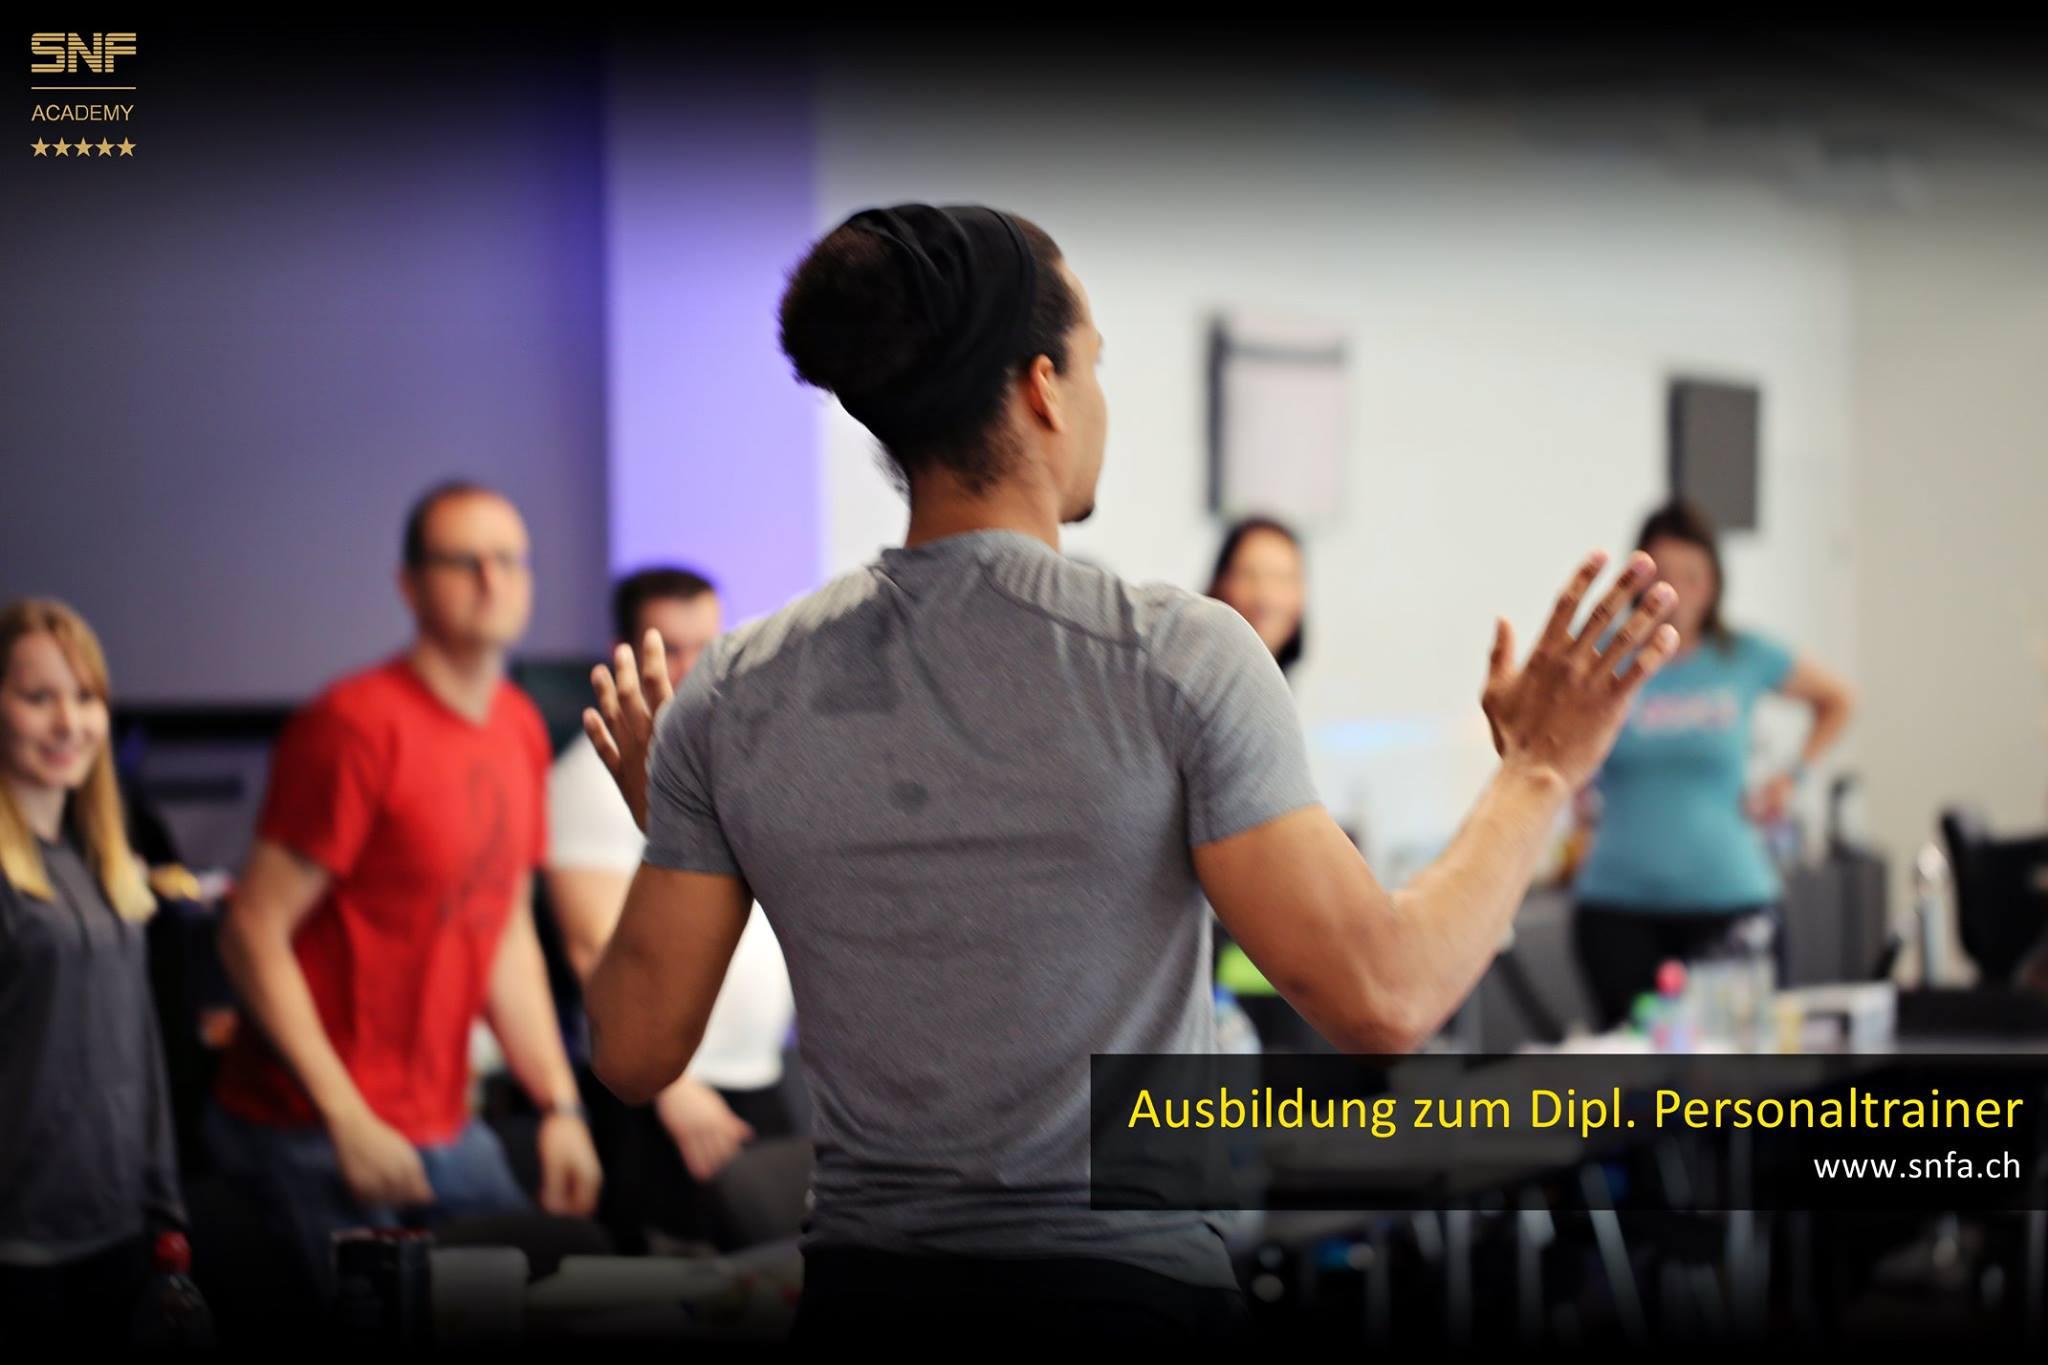 fitnesstraining zug schweiz